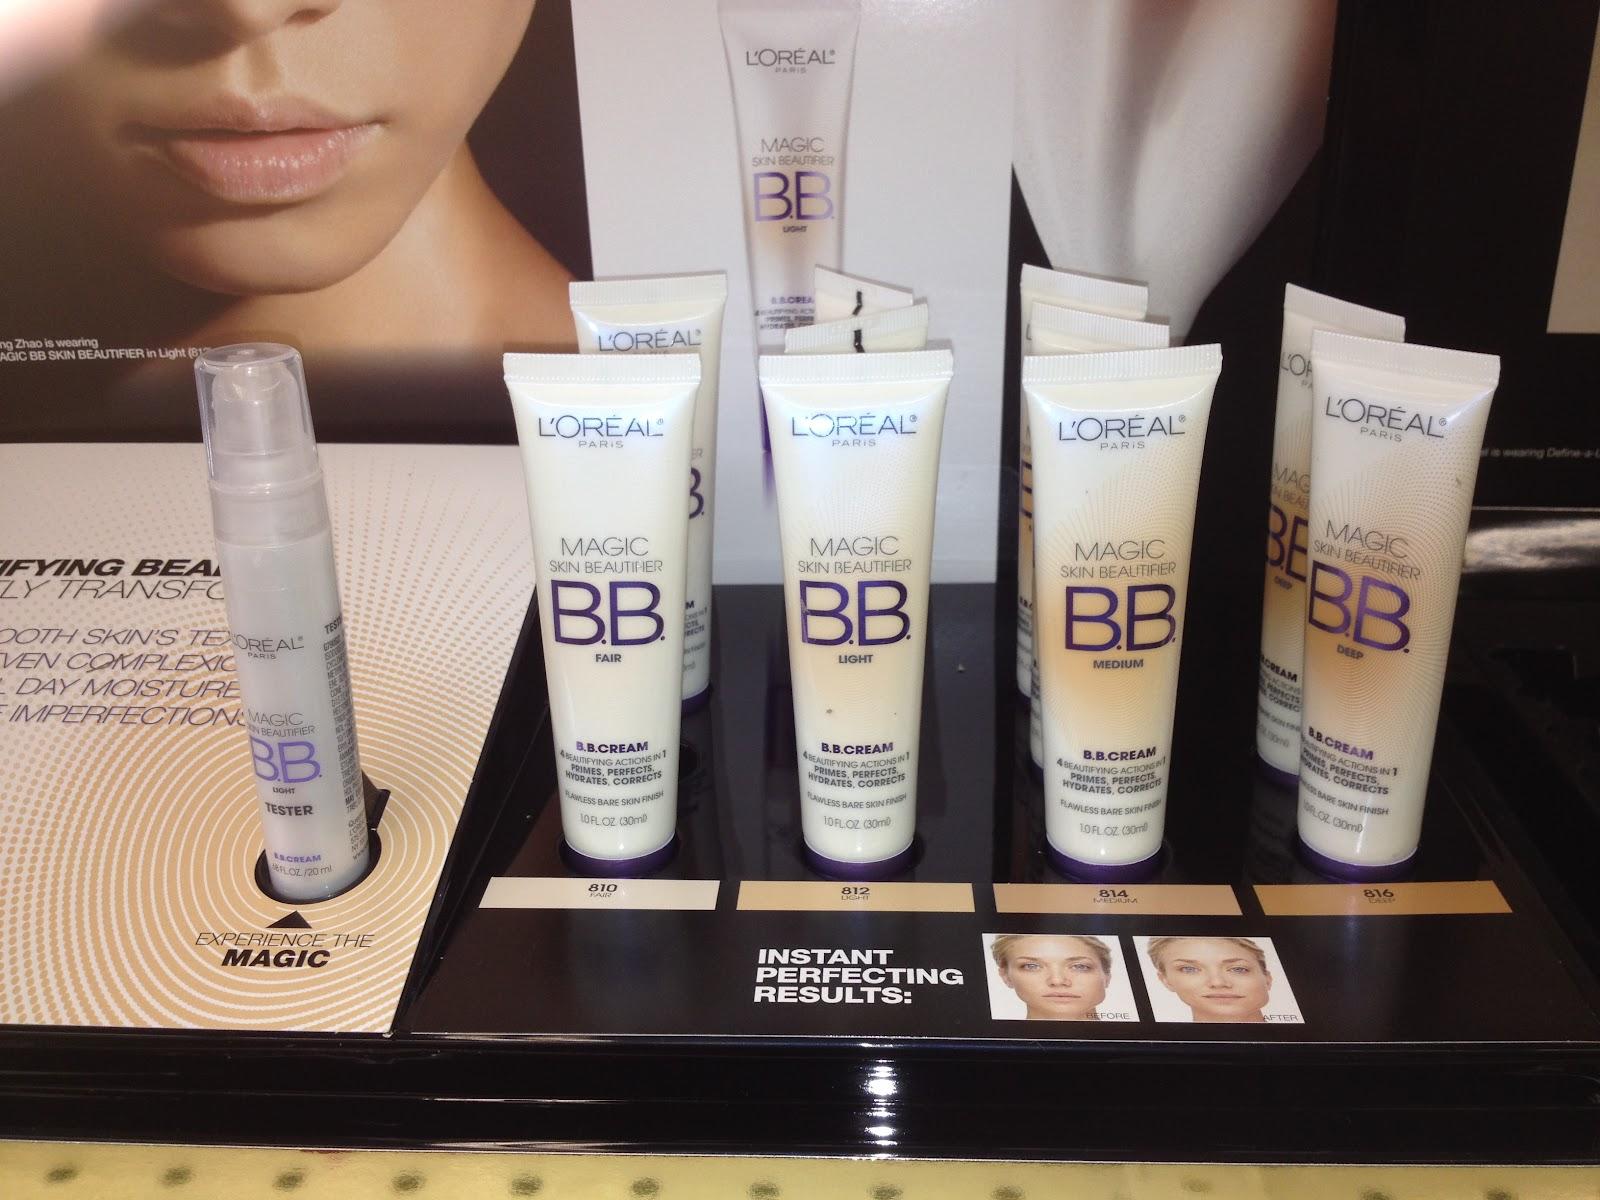 L'Oreal BB Cream Display 2012